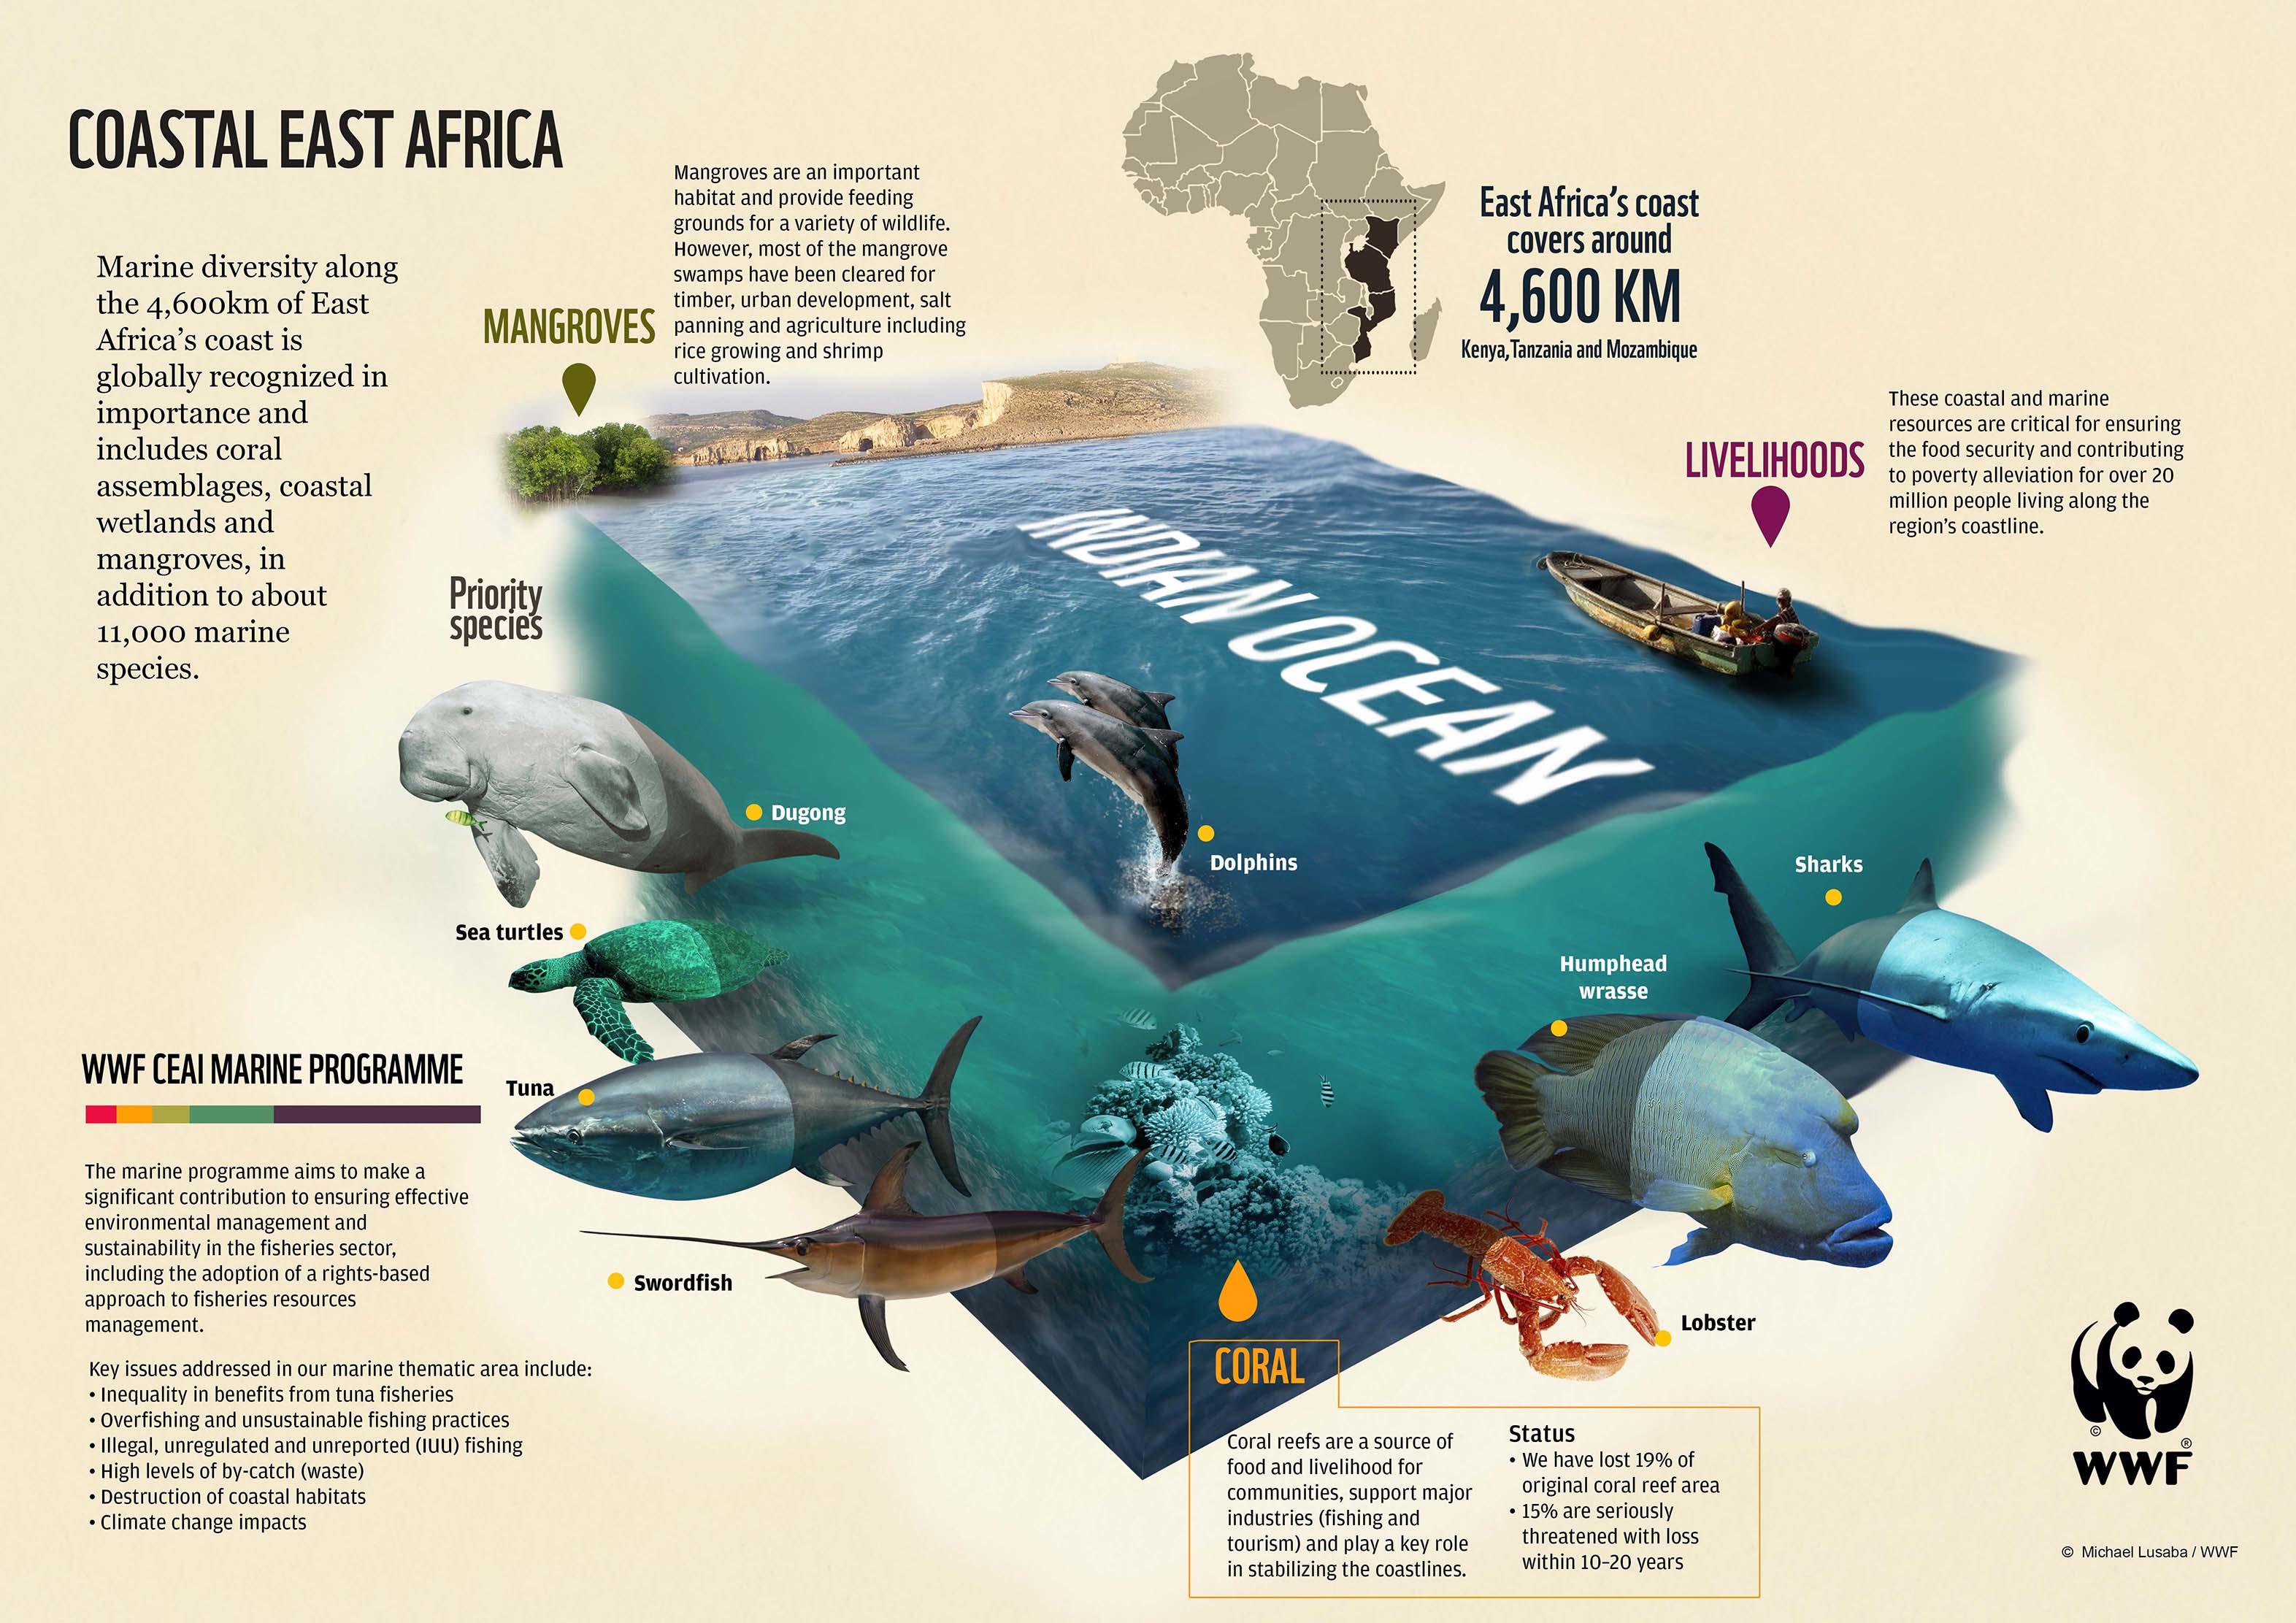 WWF Coastal East Africa infographic